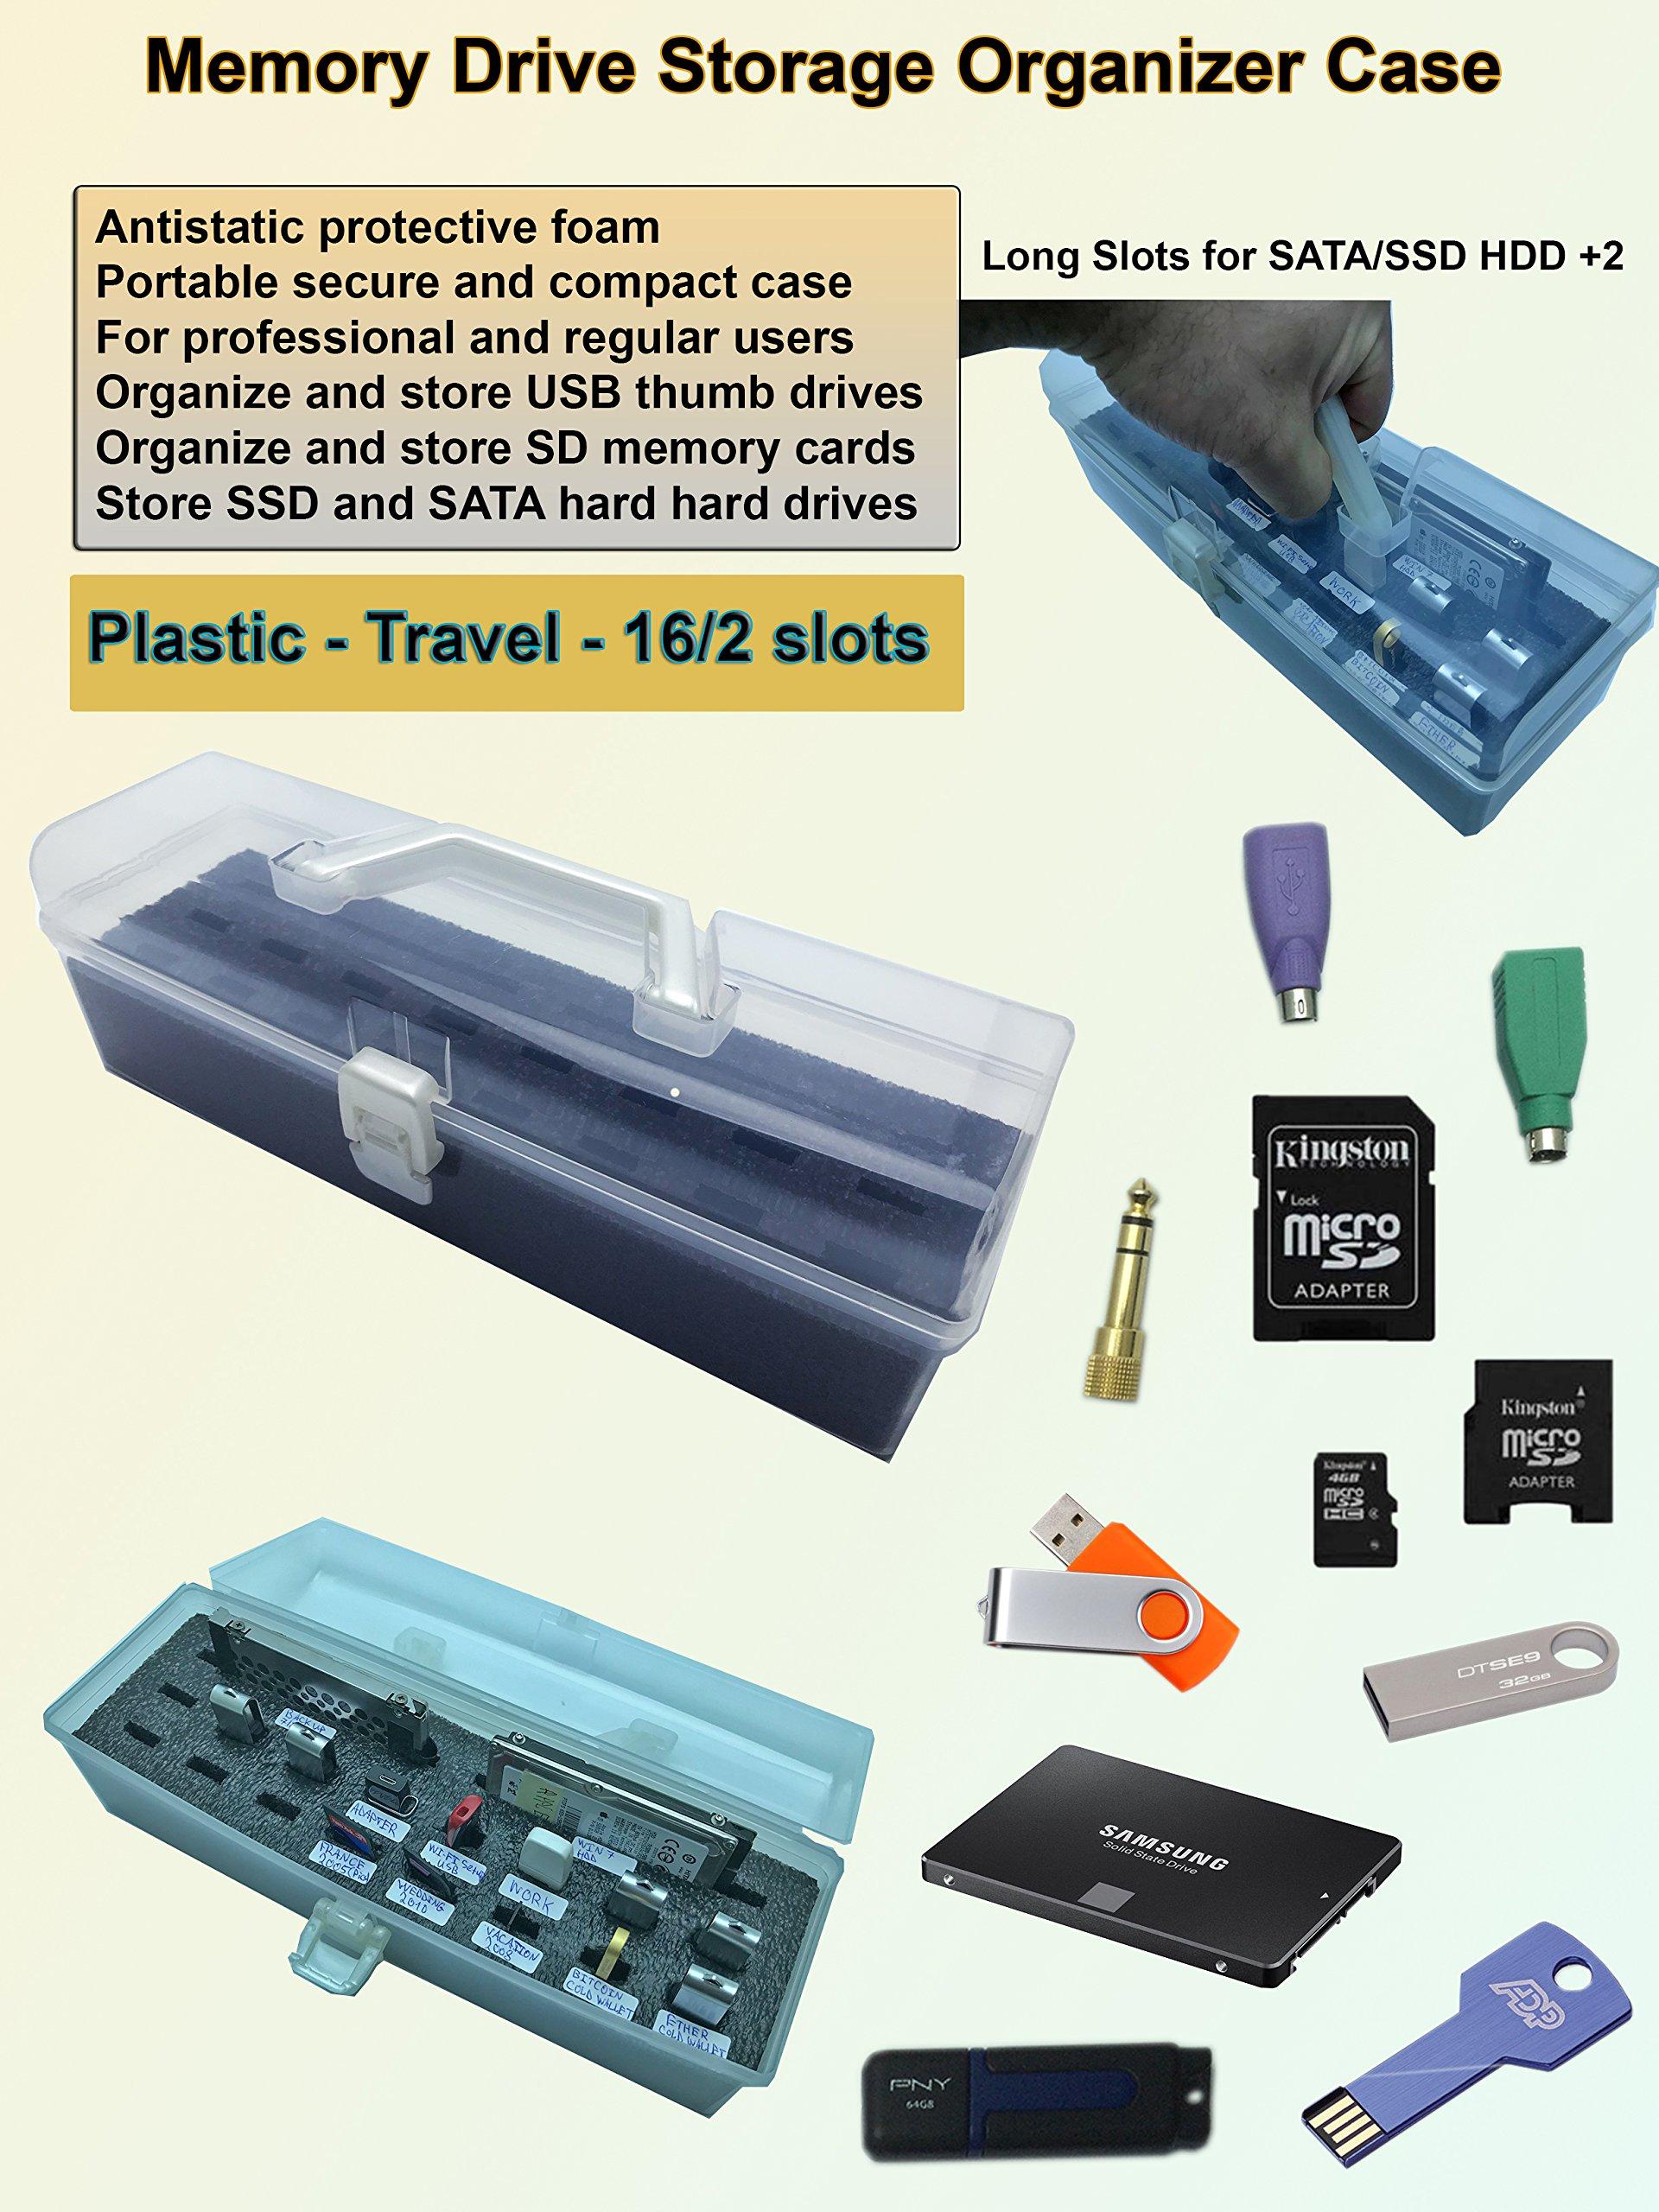 Memory Thumb Flash USB Drive and Accessories Organizer Storage Case Box - Plastic - Travel - 16/2 USB/SATA/SSD Hard Drive slots - with Antistatic Foam